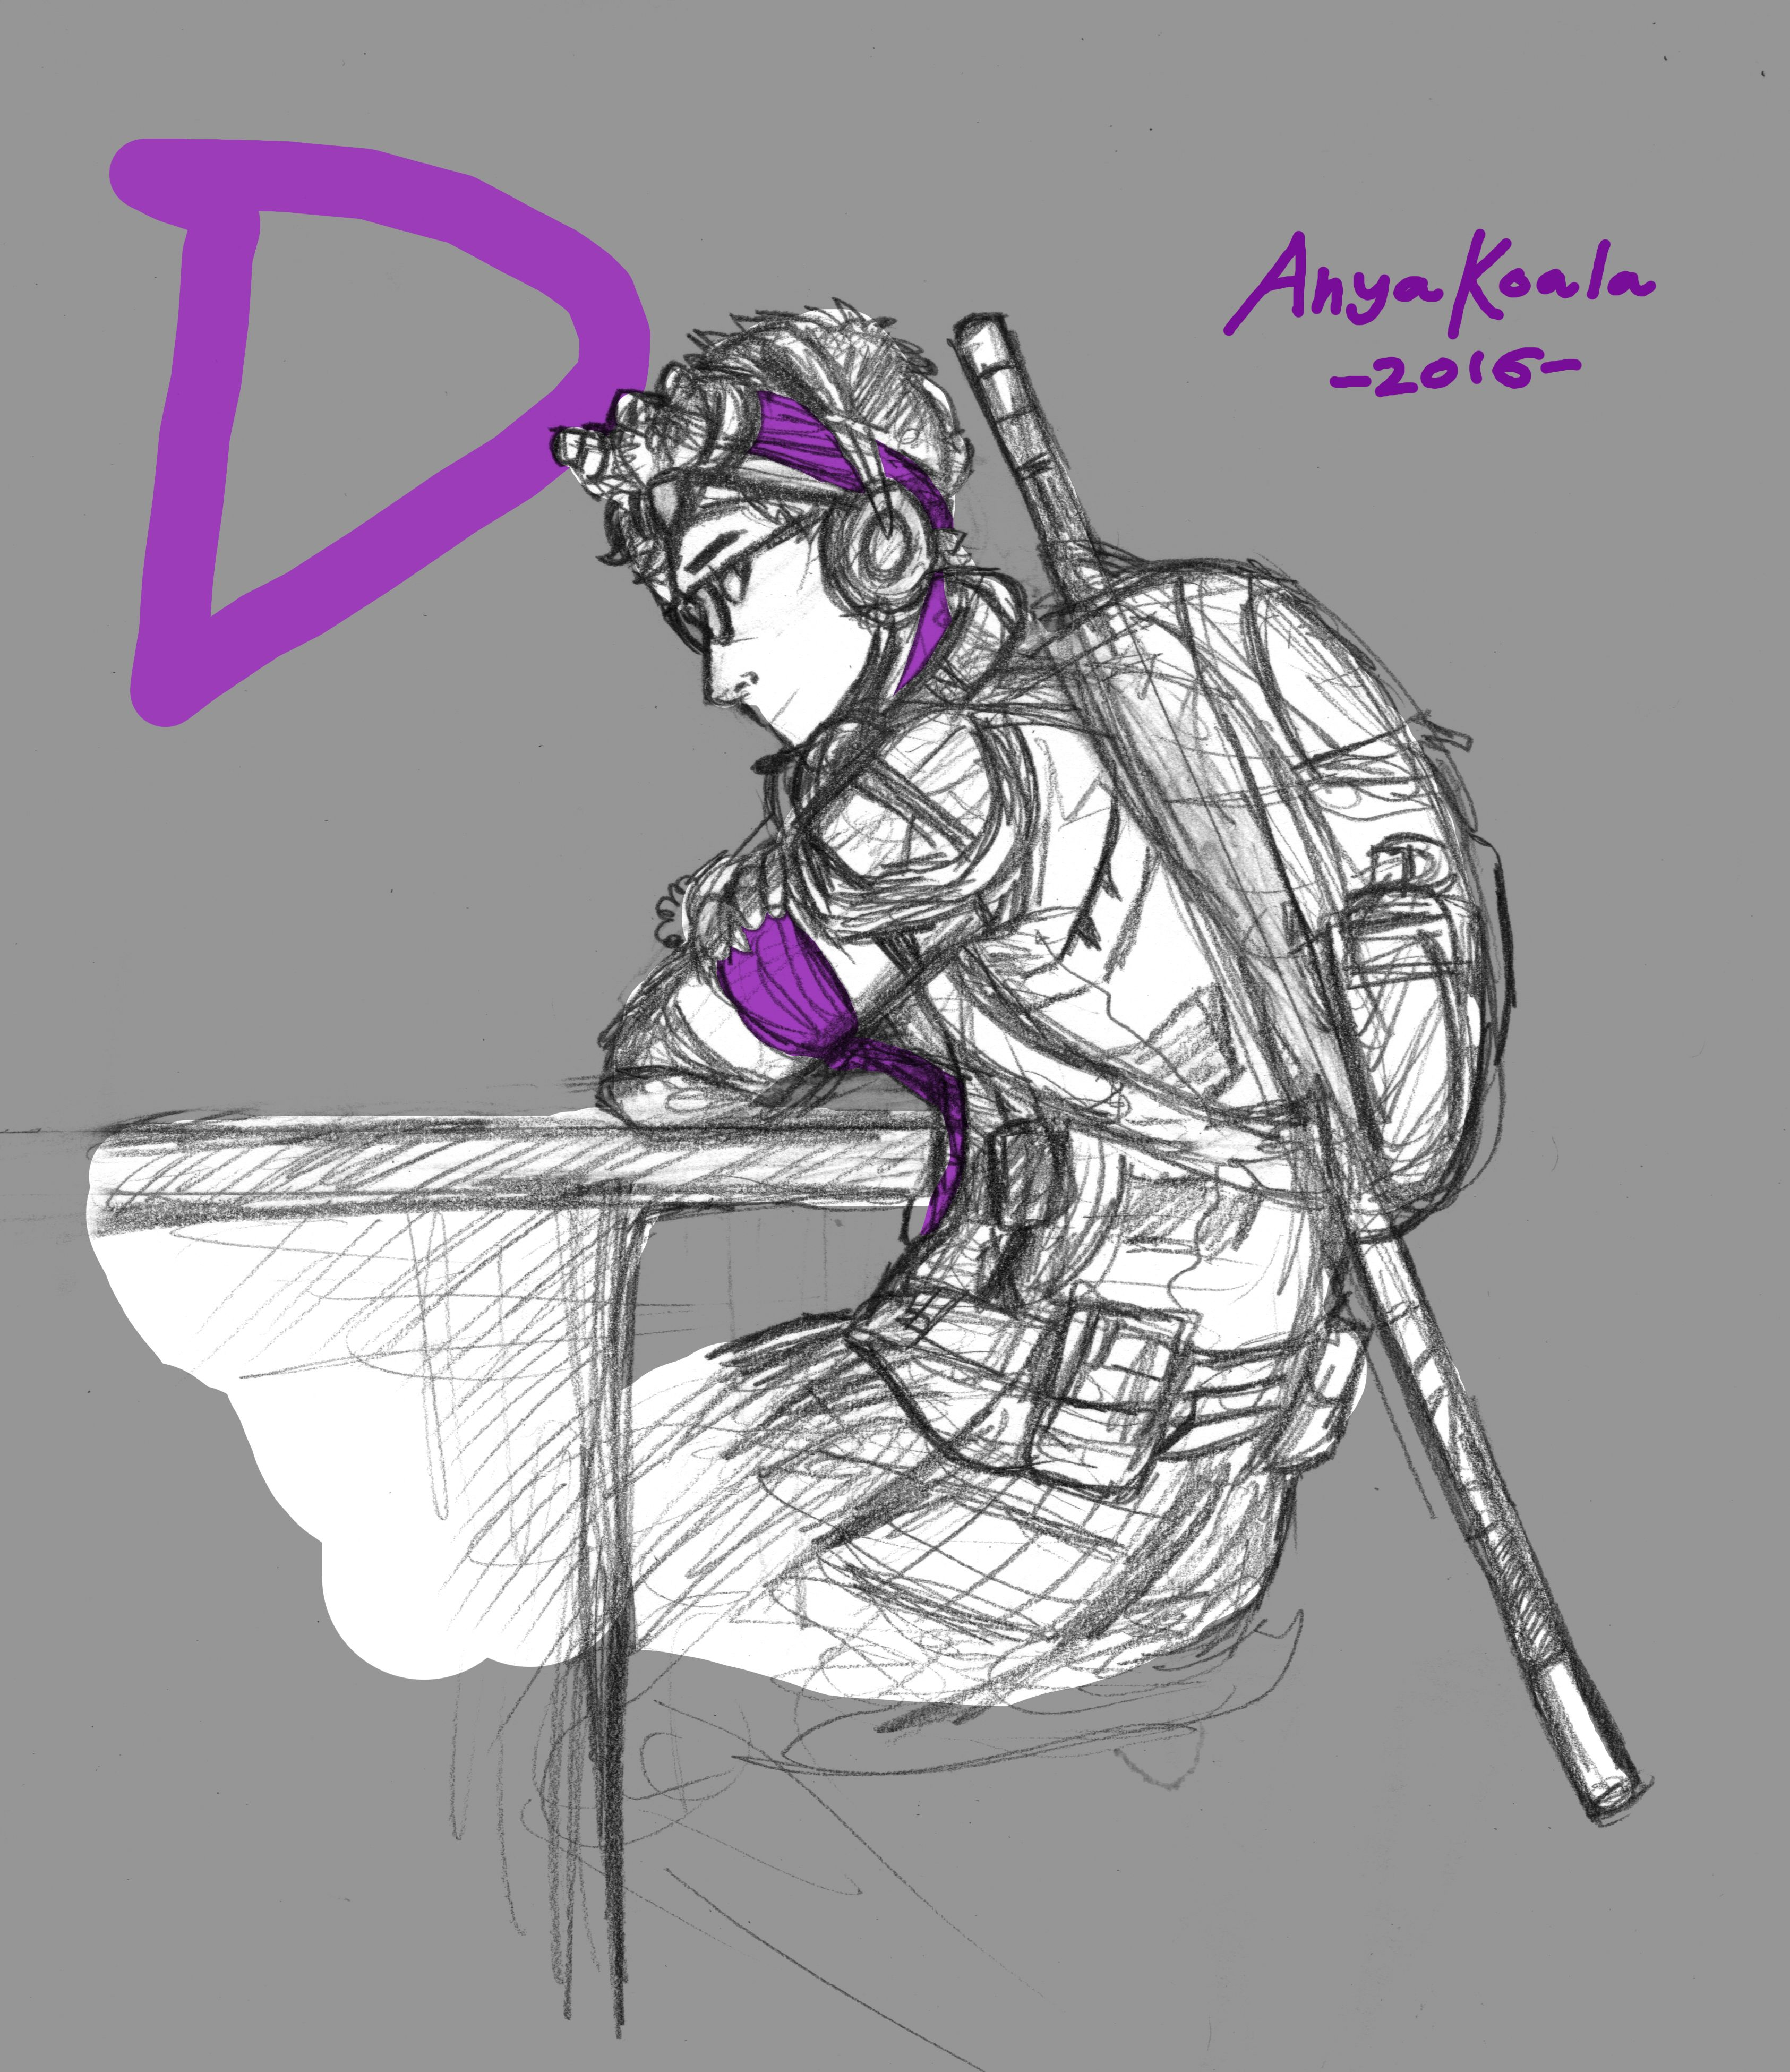 3371x3902 Human Donatello. Human Design. Anya Koala. Nickelodeon. Donnie